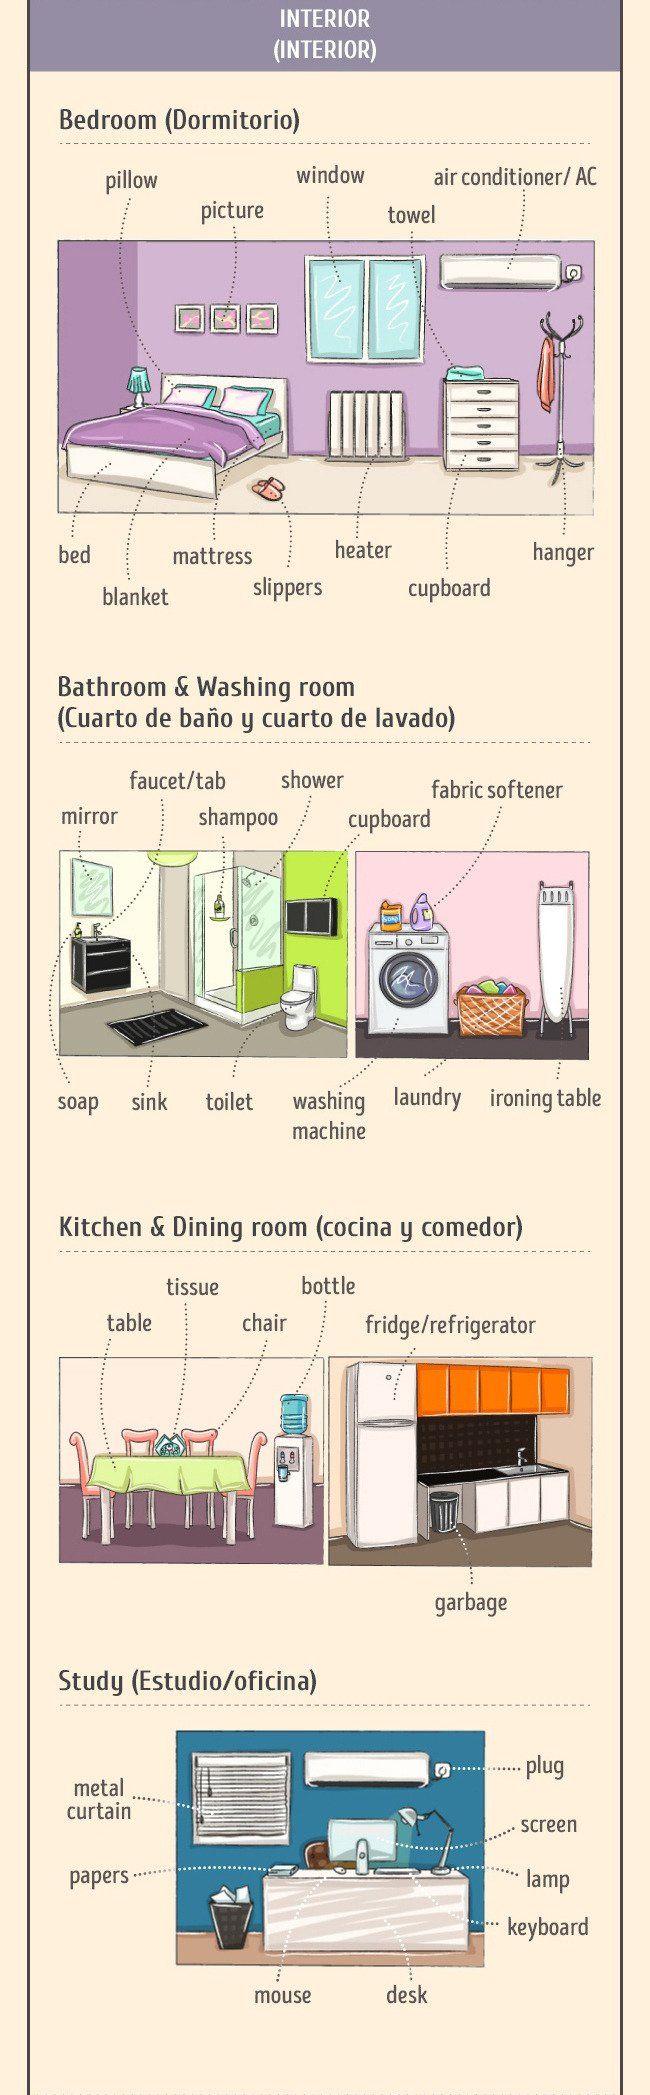 Nombres El Hogar Aprender Ingles Ingles Verbos Ingles